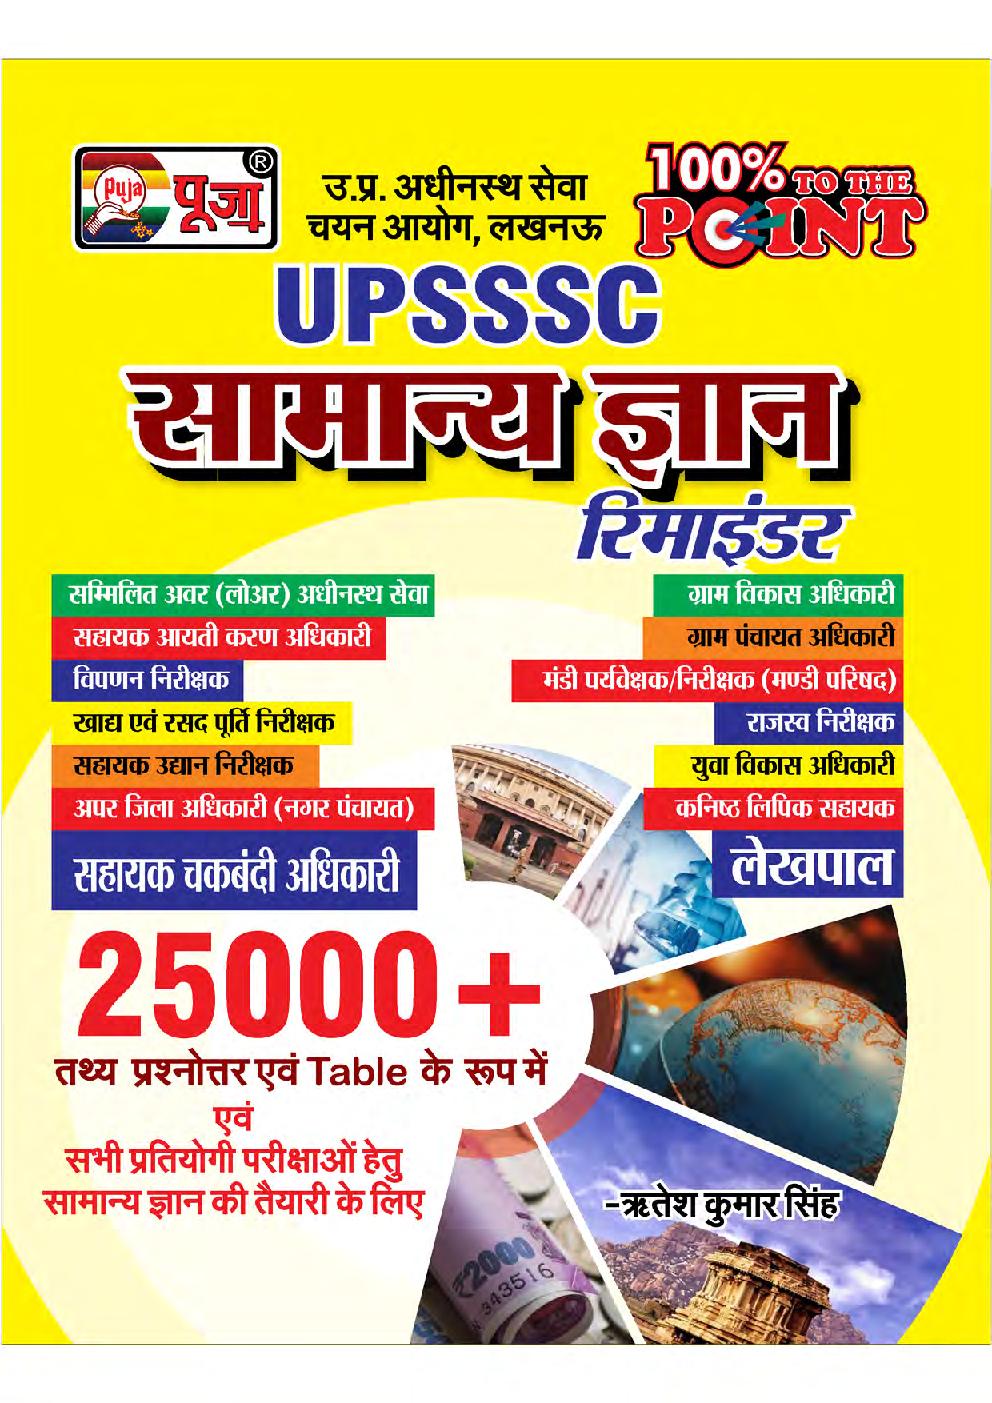 Puja UPSSSC सामान्य ज्ञान (Reminder) - Page 1